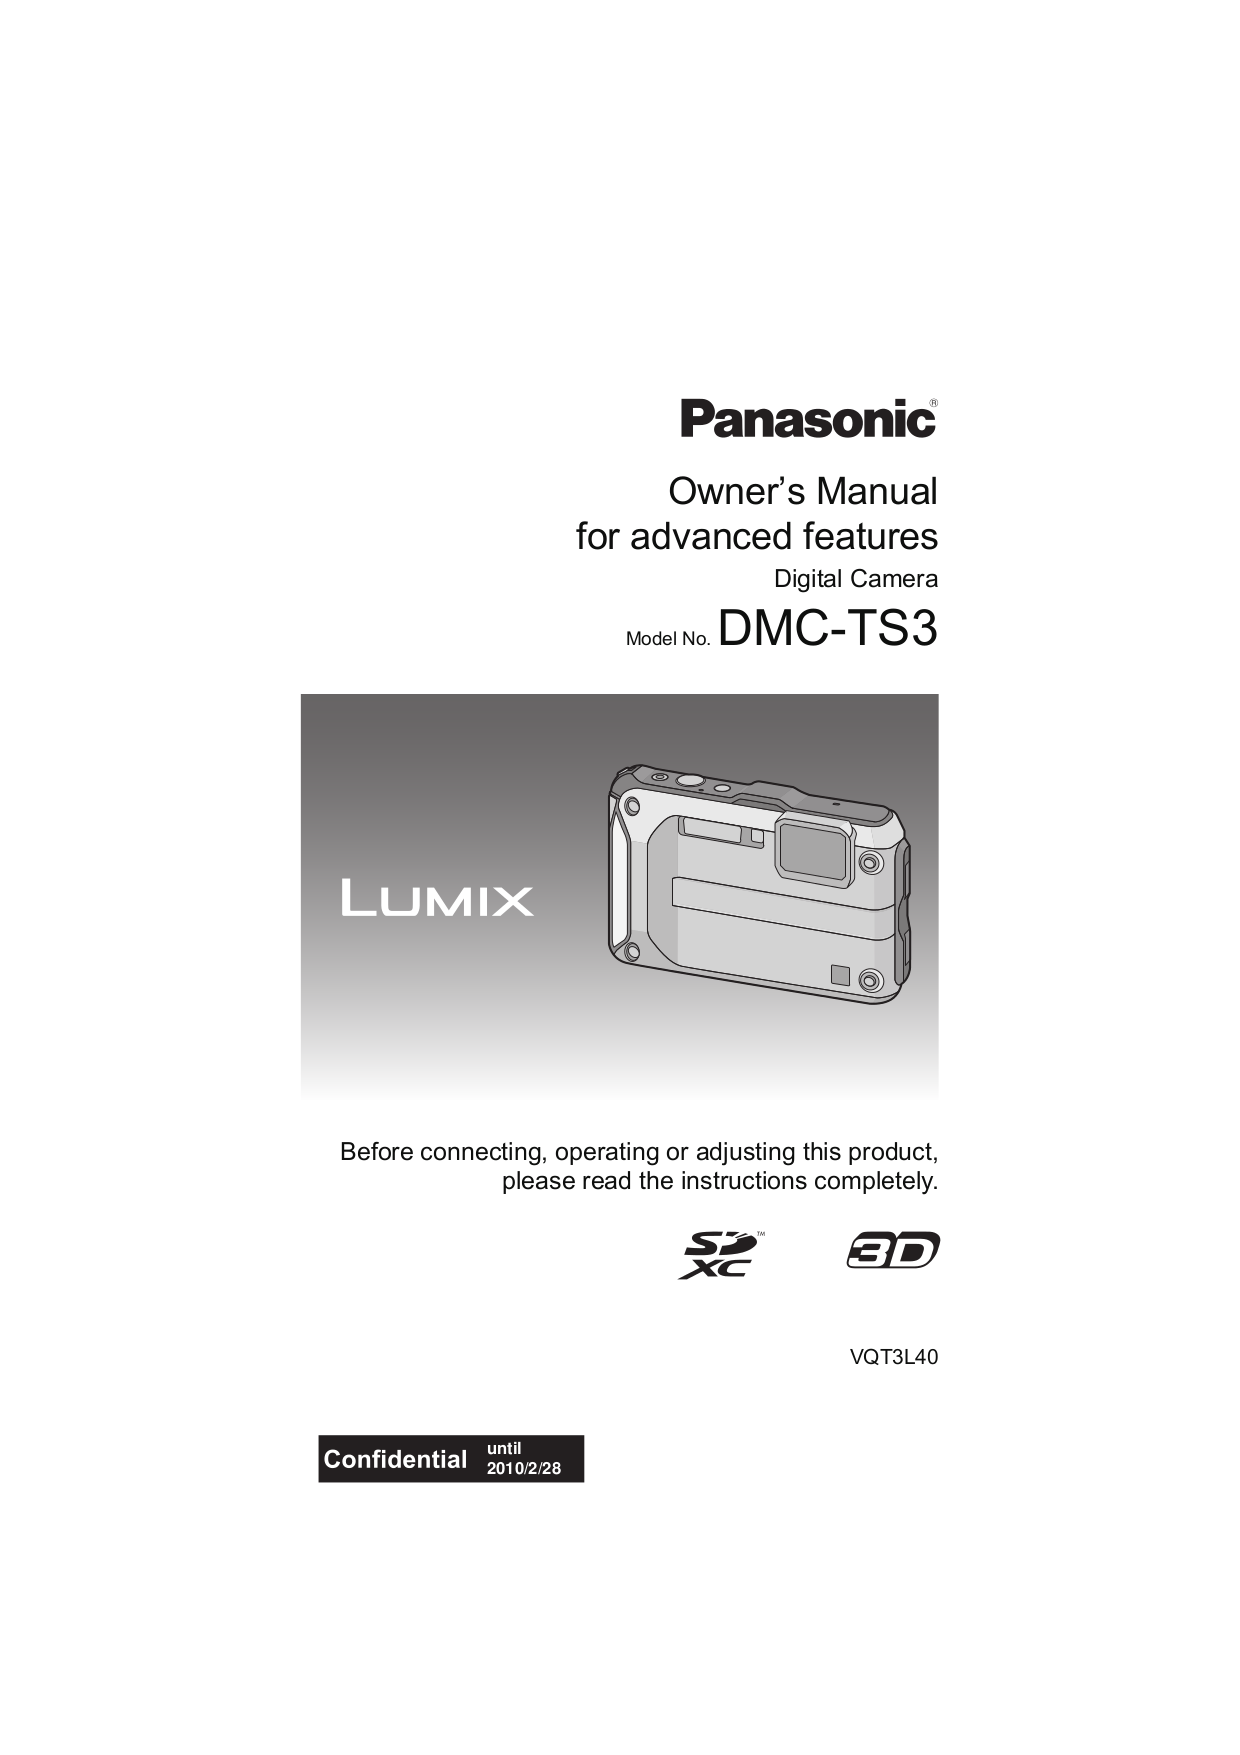 pdf for Panasonic Digital Camera Lumix DMC-TS3 manual